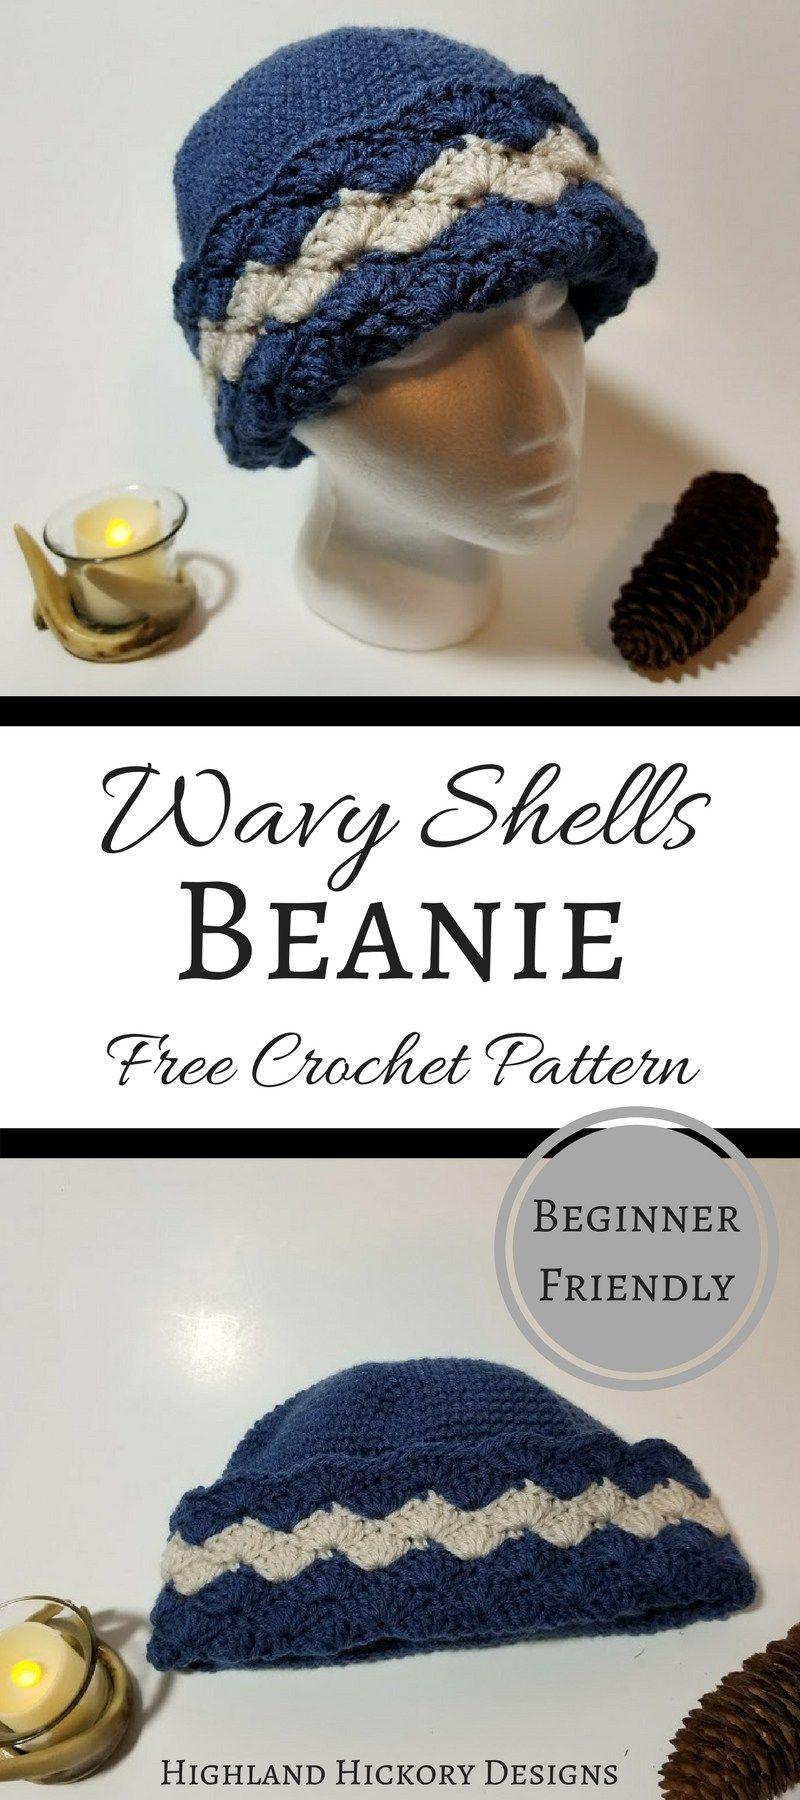 Wavy Shells Beanie